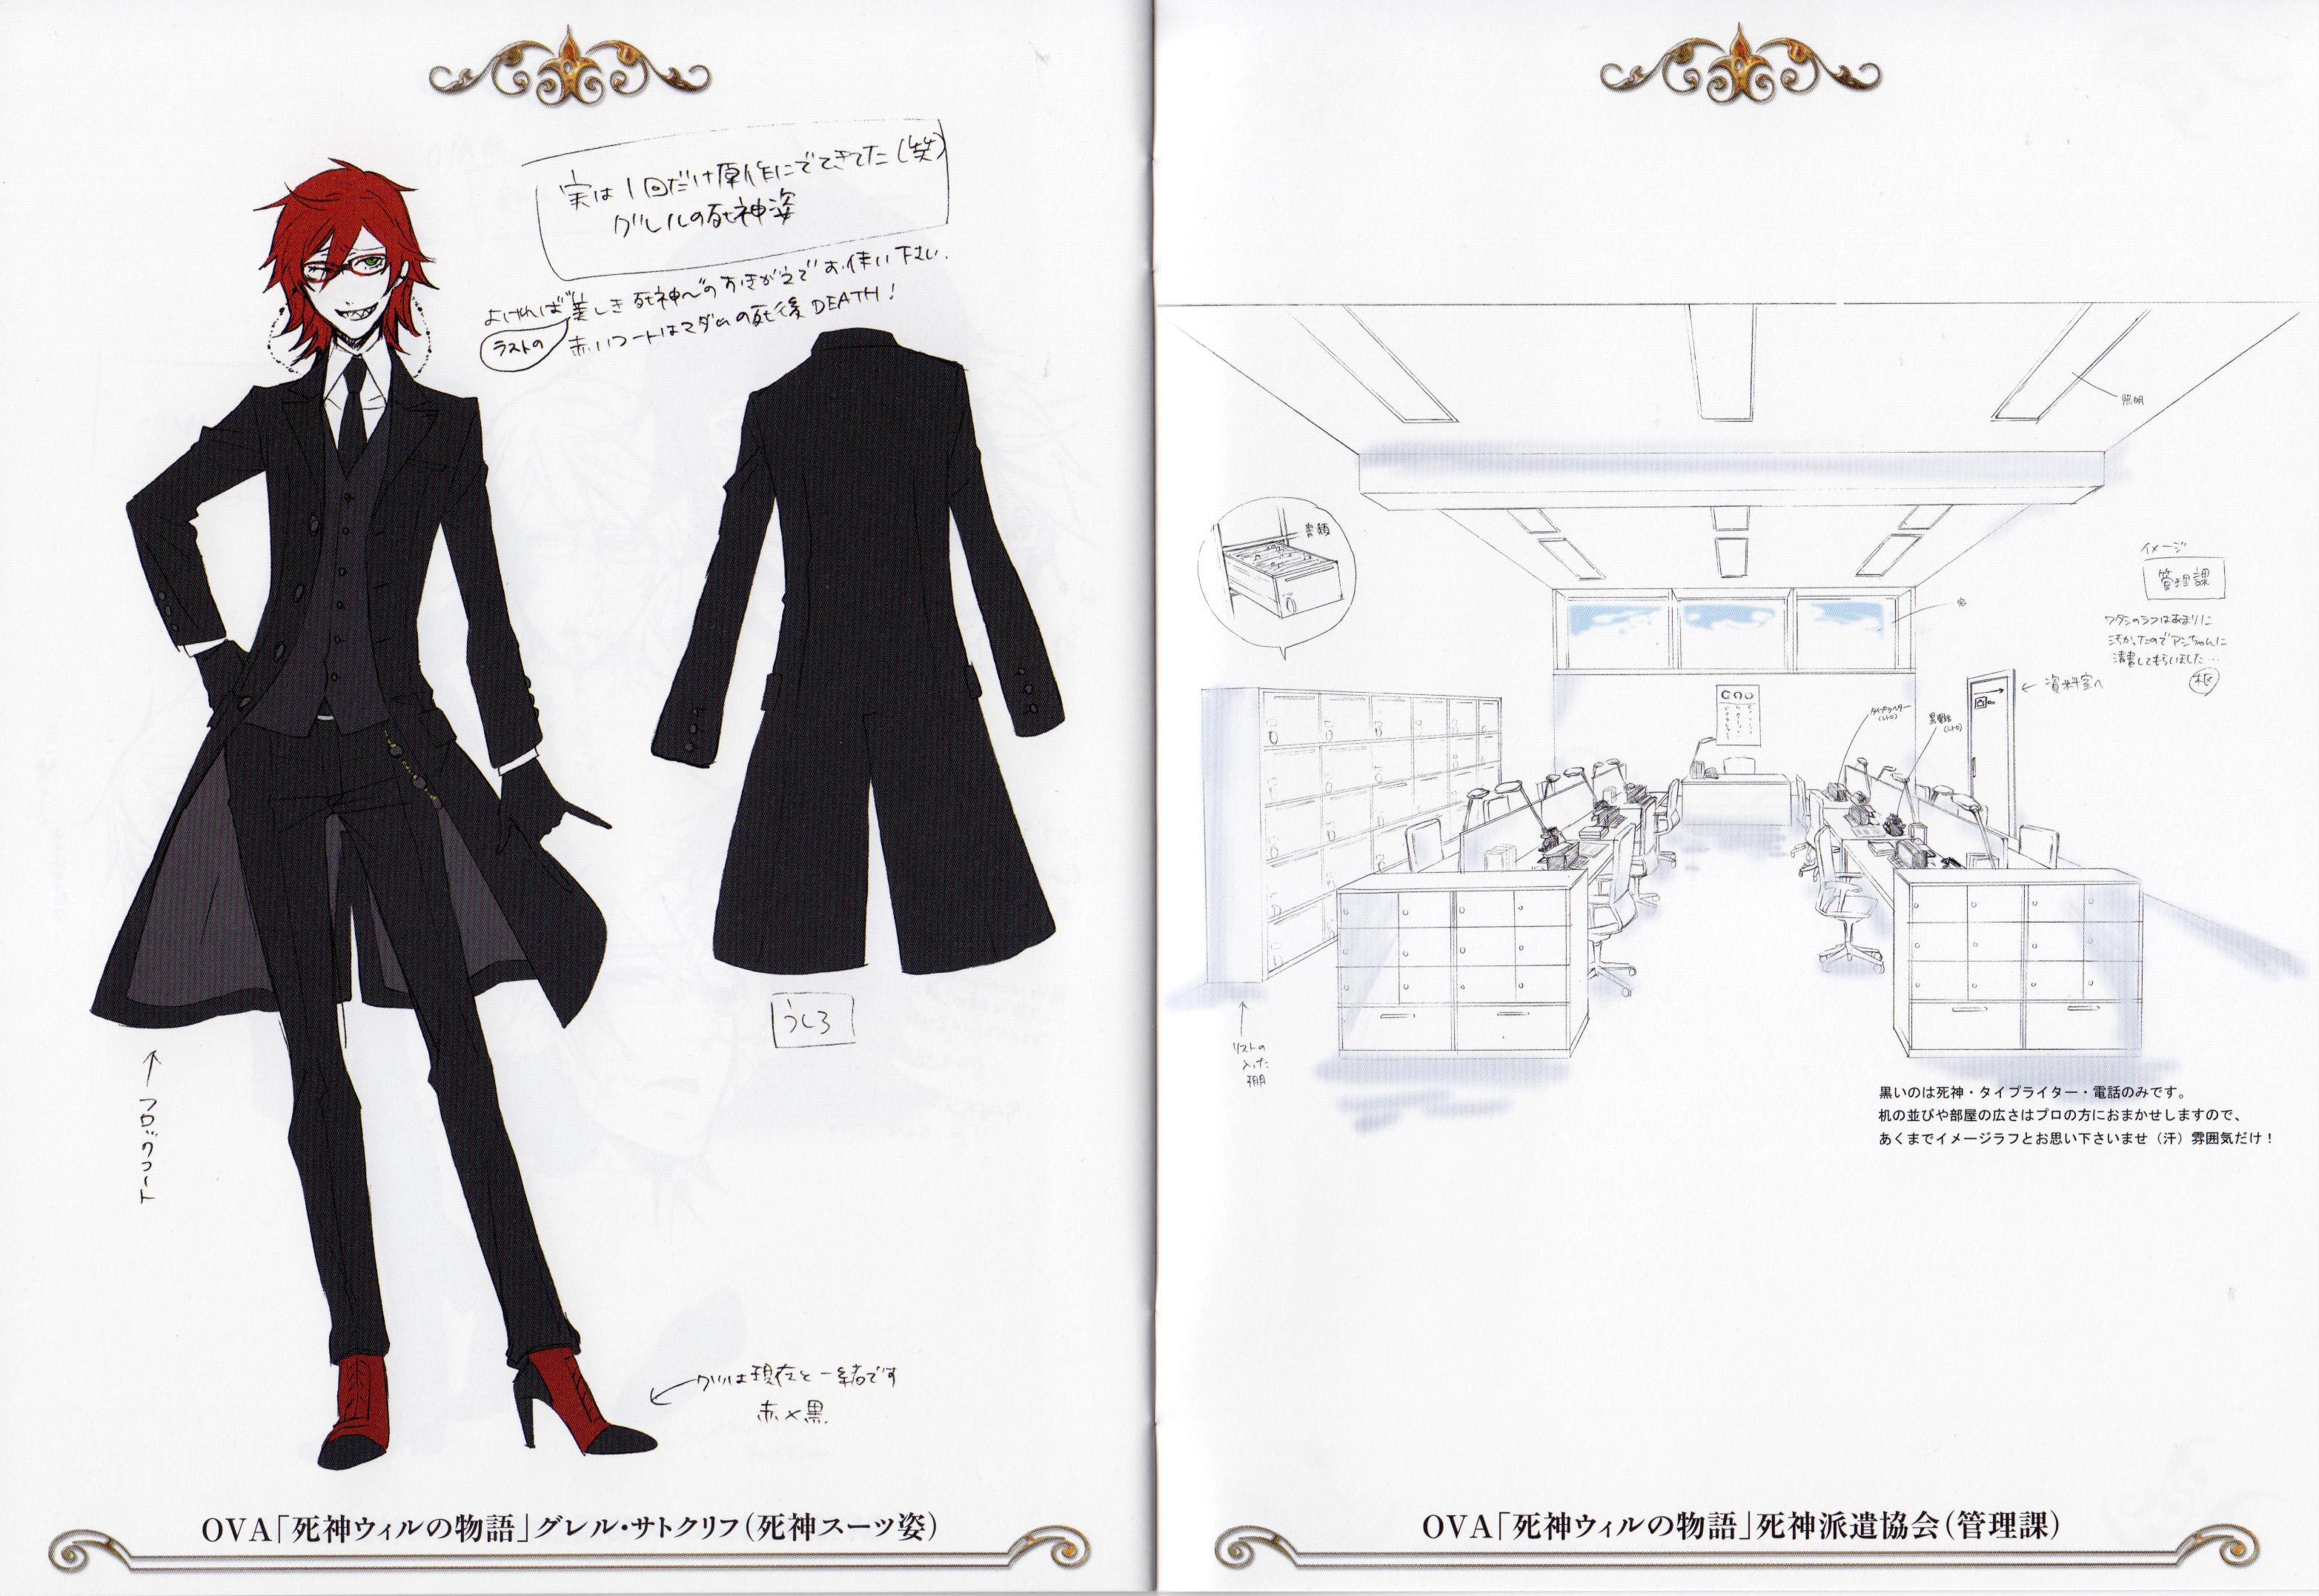 Kuroshitsuji Character Design Book : Grell sutcliff kuroshitsuji image  zerochan